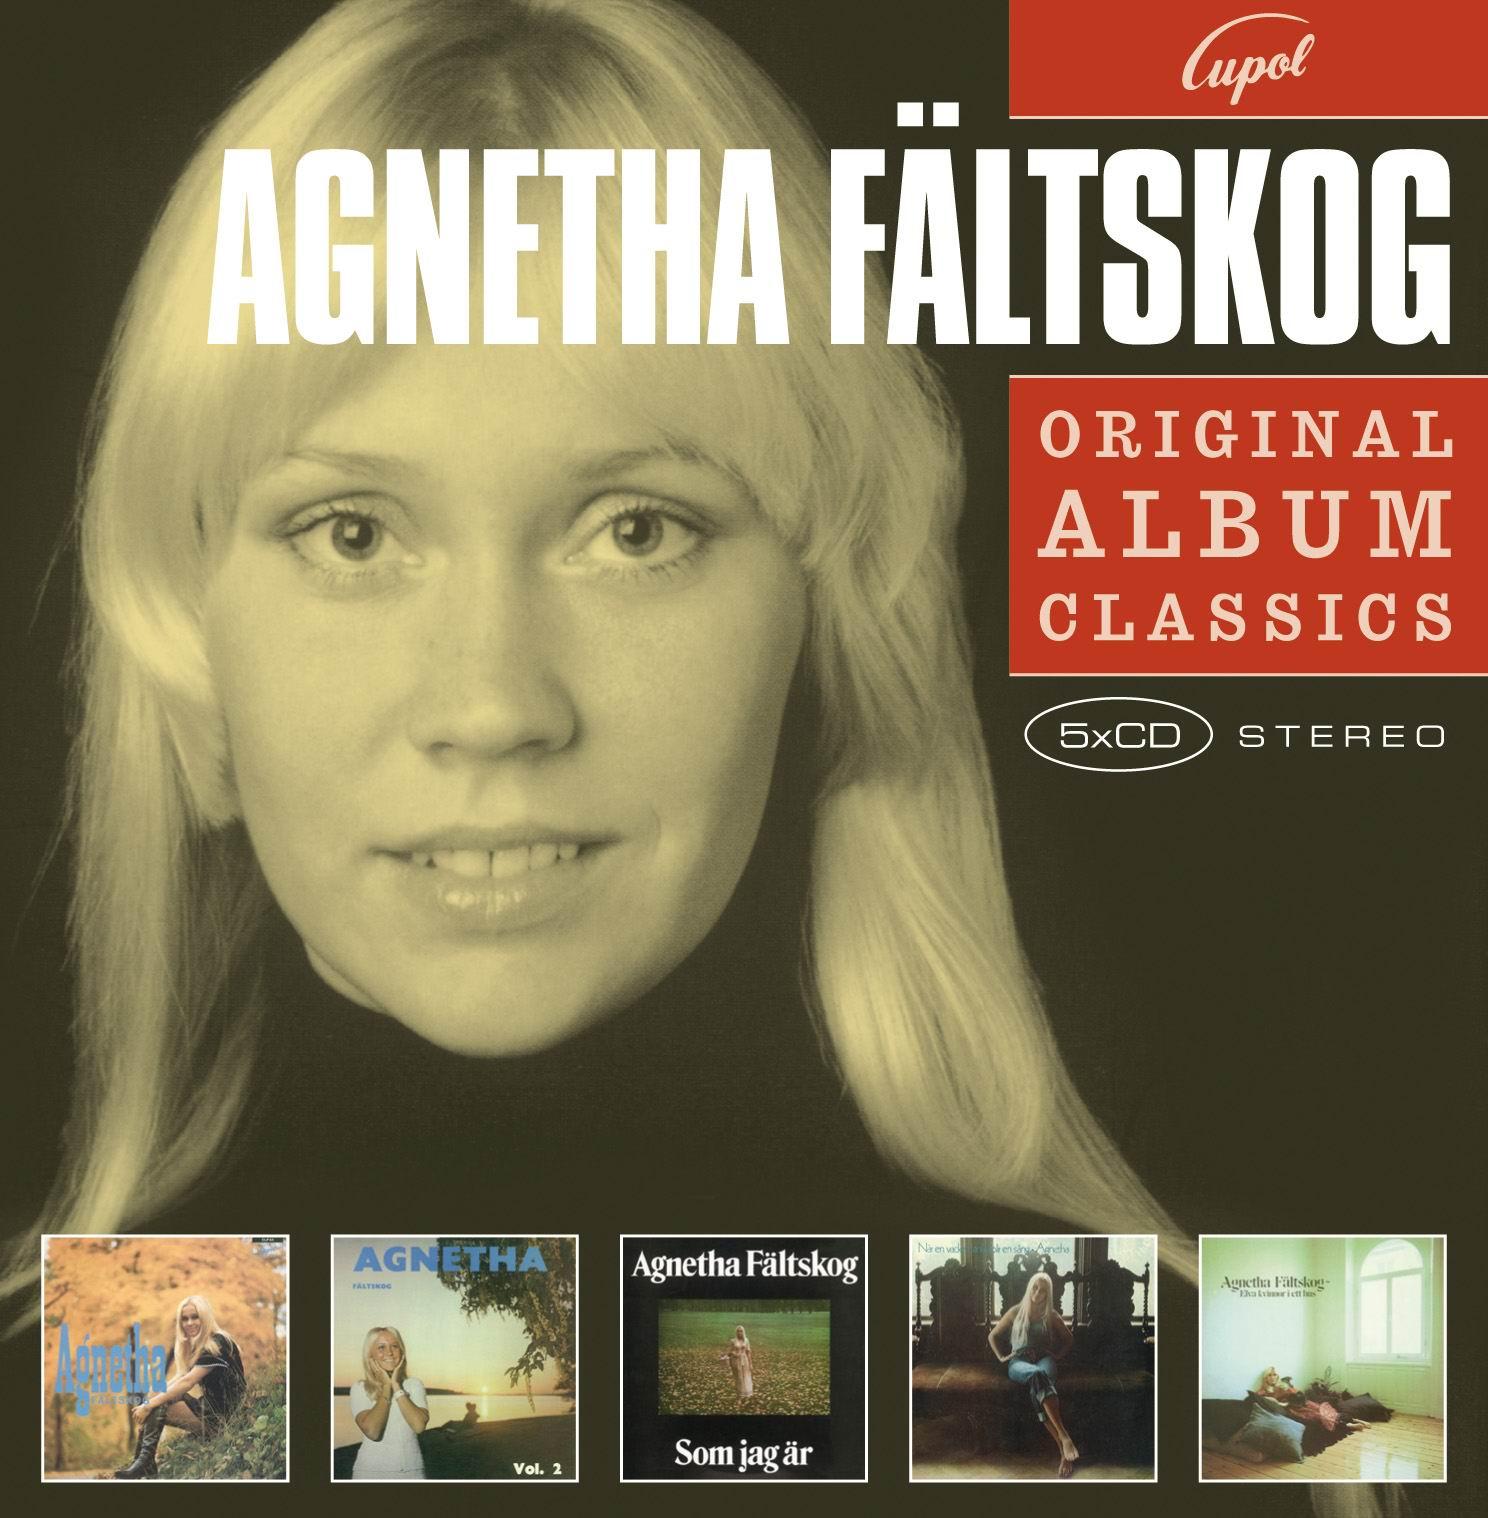 agnetha f ltskog original album classics 5 cds. Black Bedroom Furniture Sets. Home Design Ideas